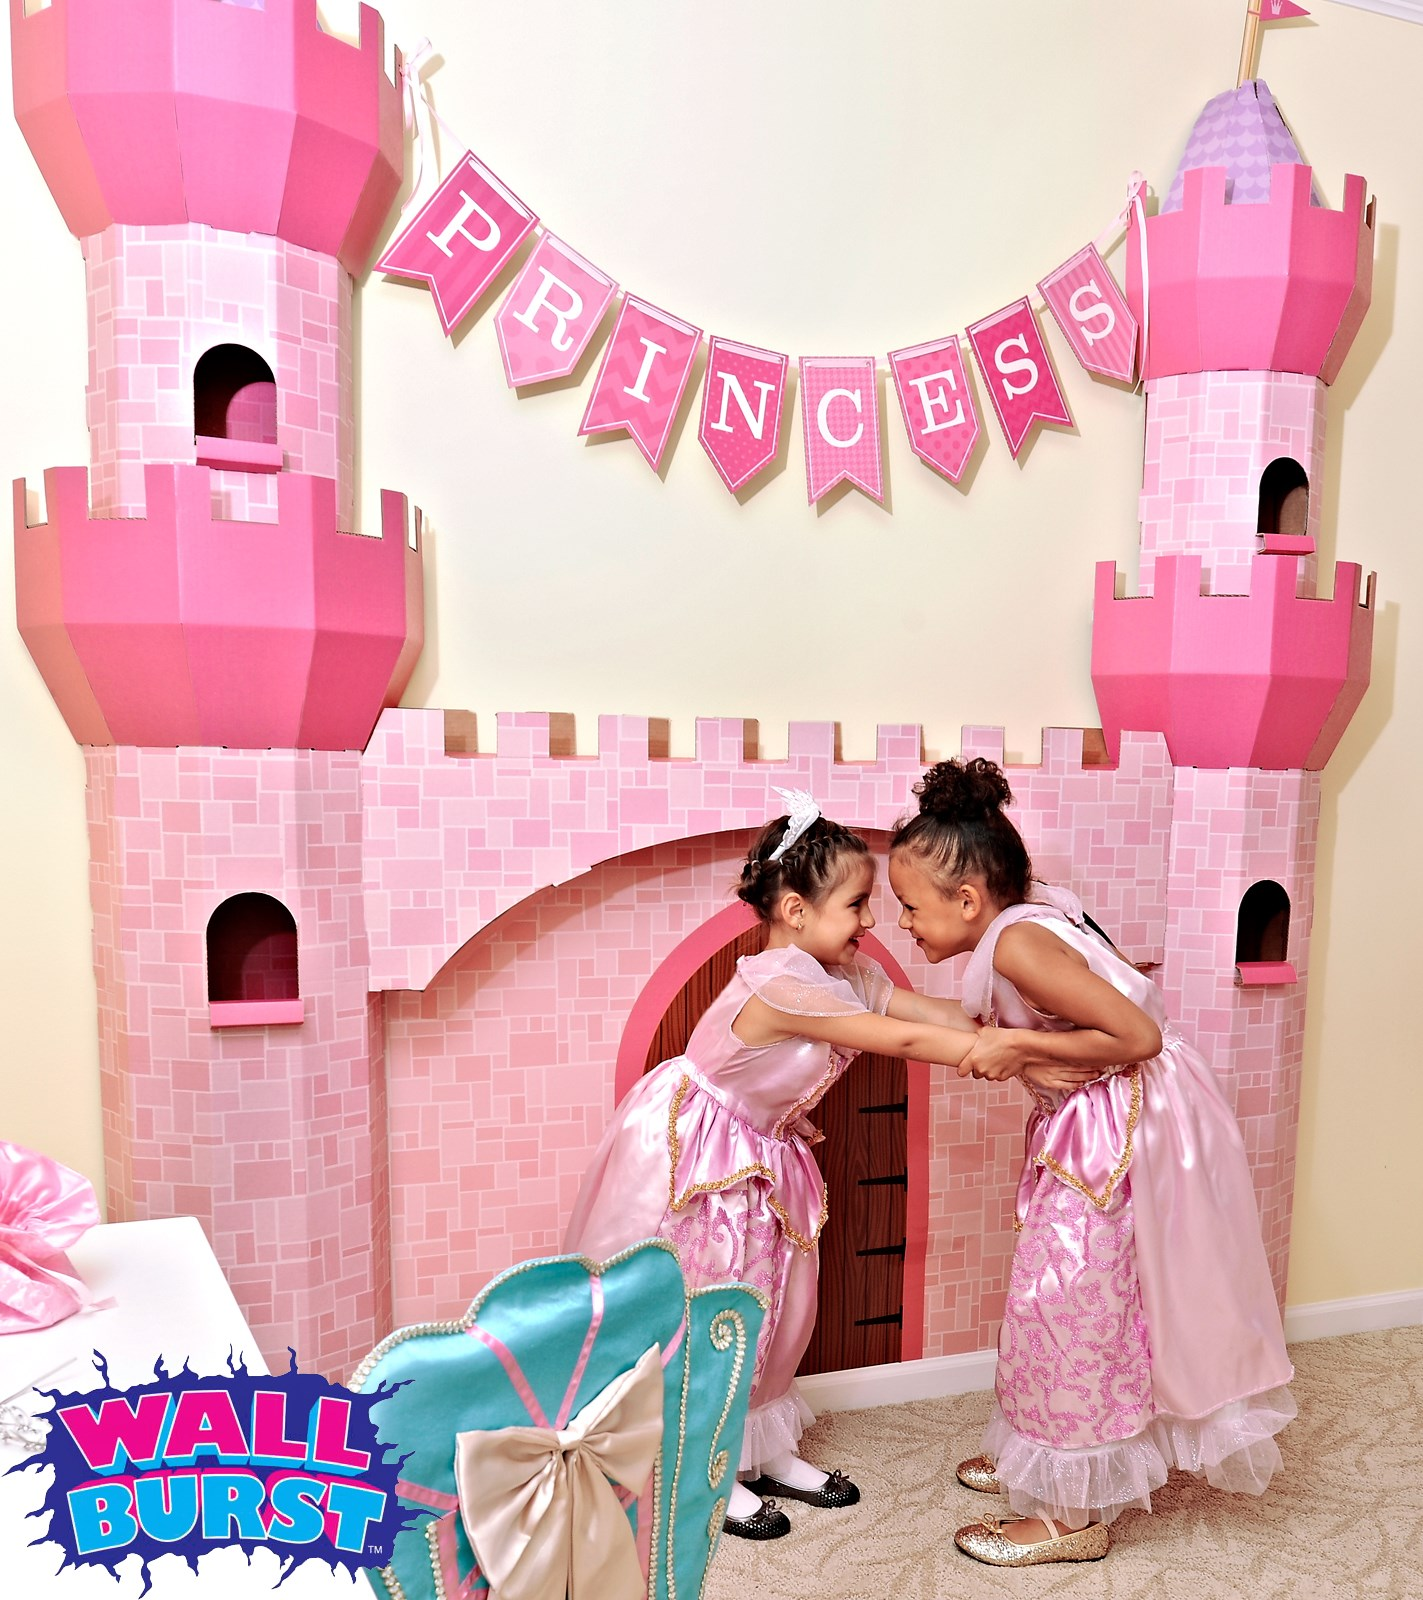 castle spire - wall burst | birthdayexpress